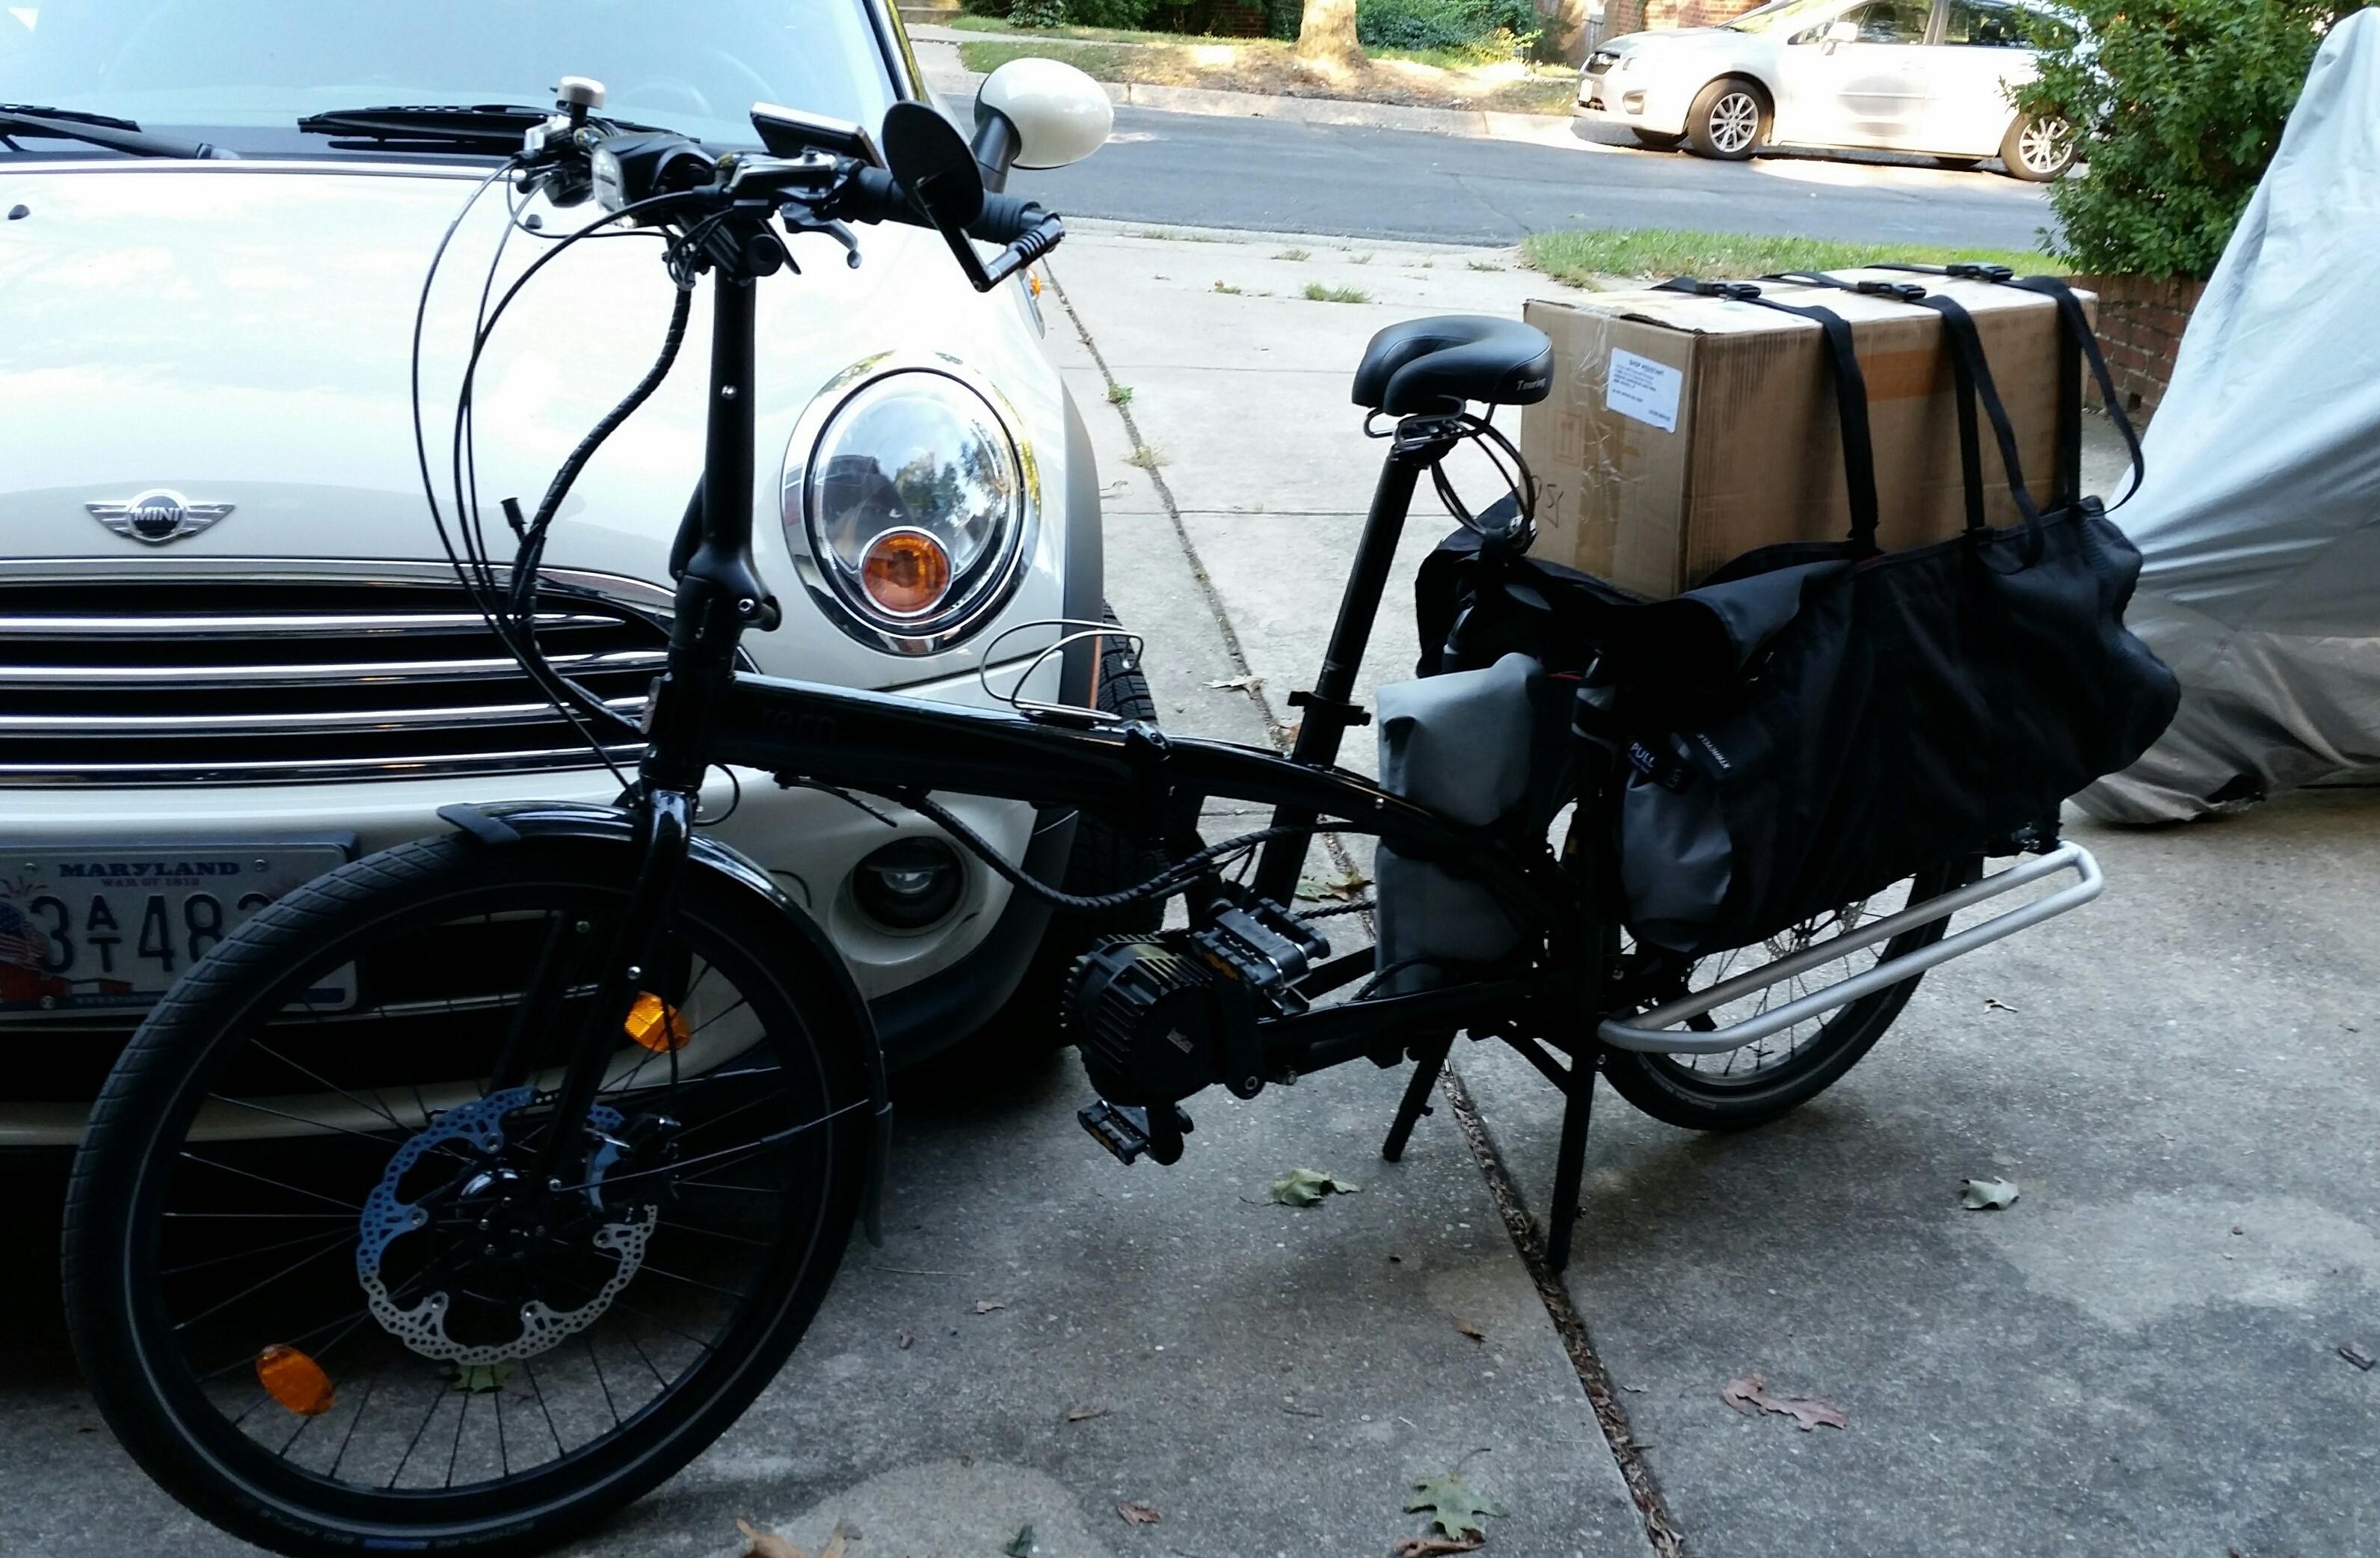 Small wheel compact cargo e-bikes | Electric Bike Forum - Q&A, Help